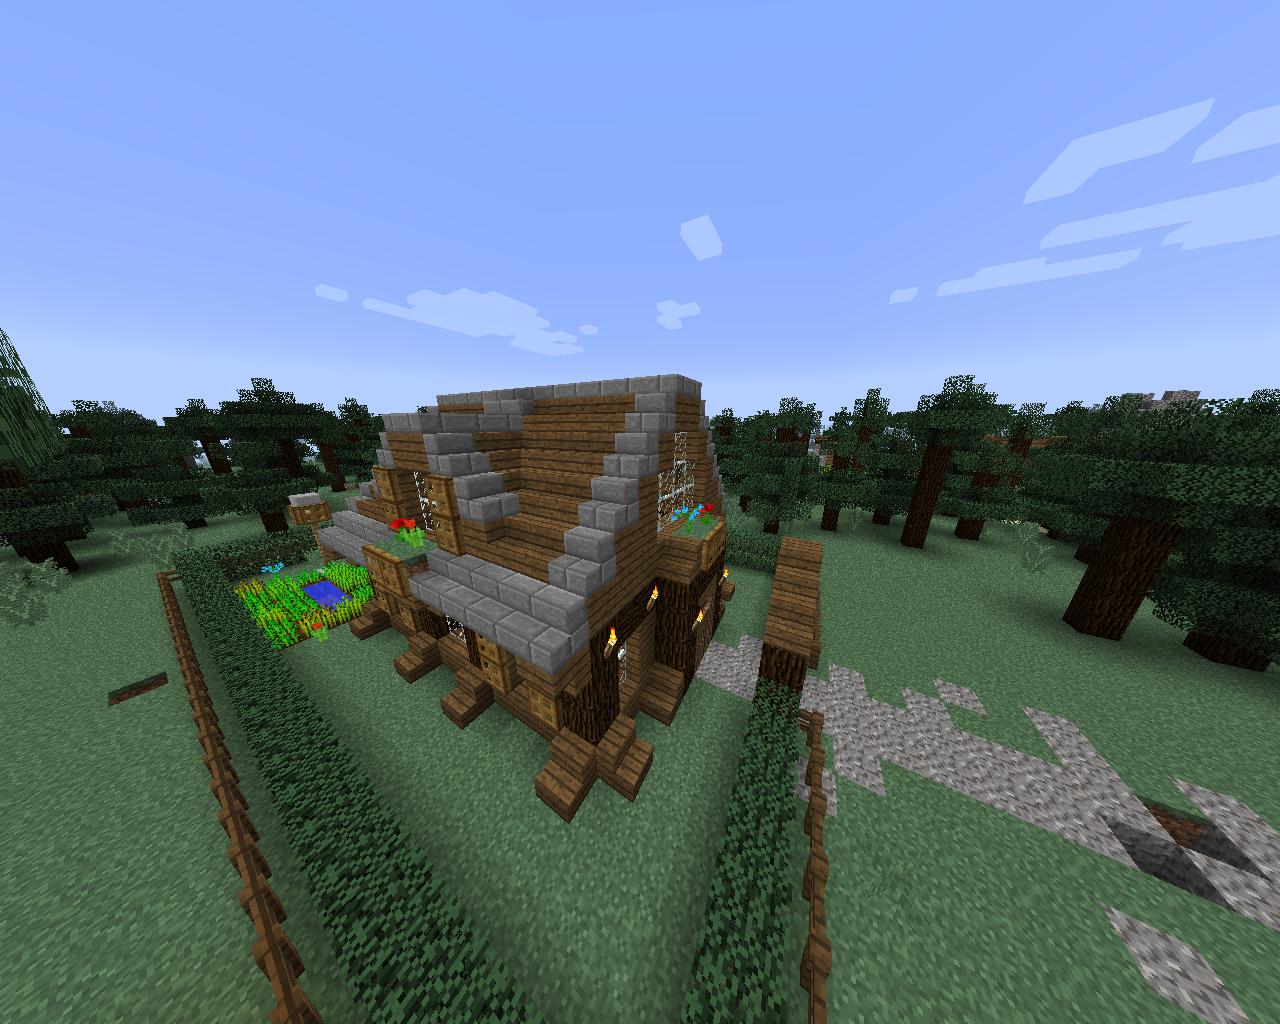 Minecraft Medieval creations - 2